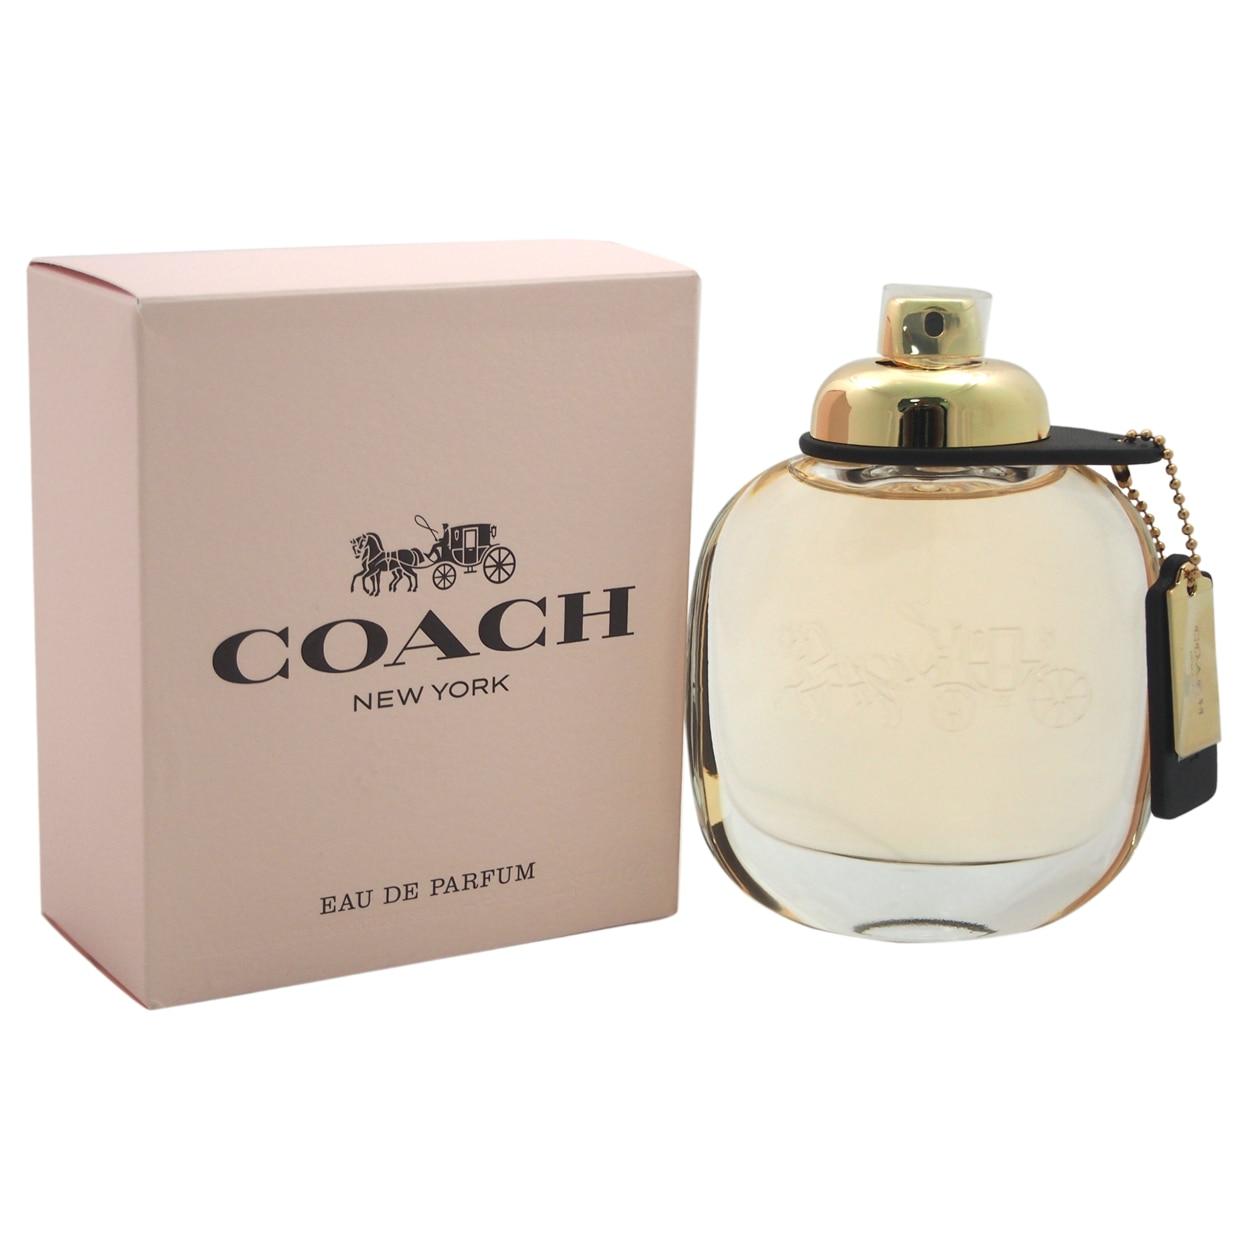 Coach New York by Coach for Women - 3 oz EDP Spray coach coach for women